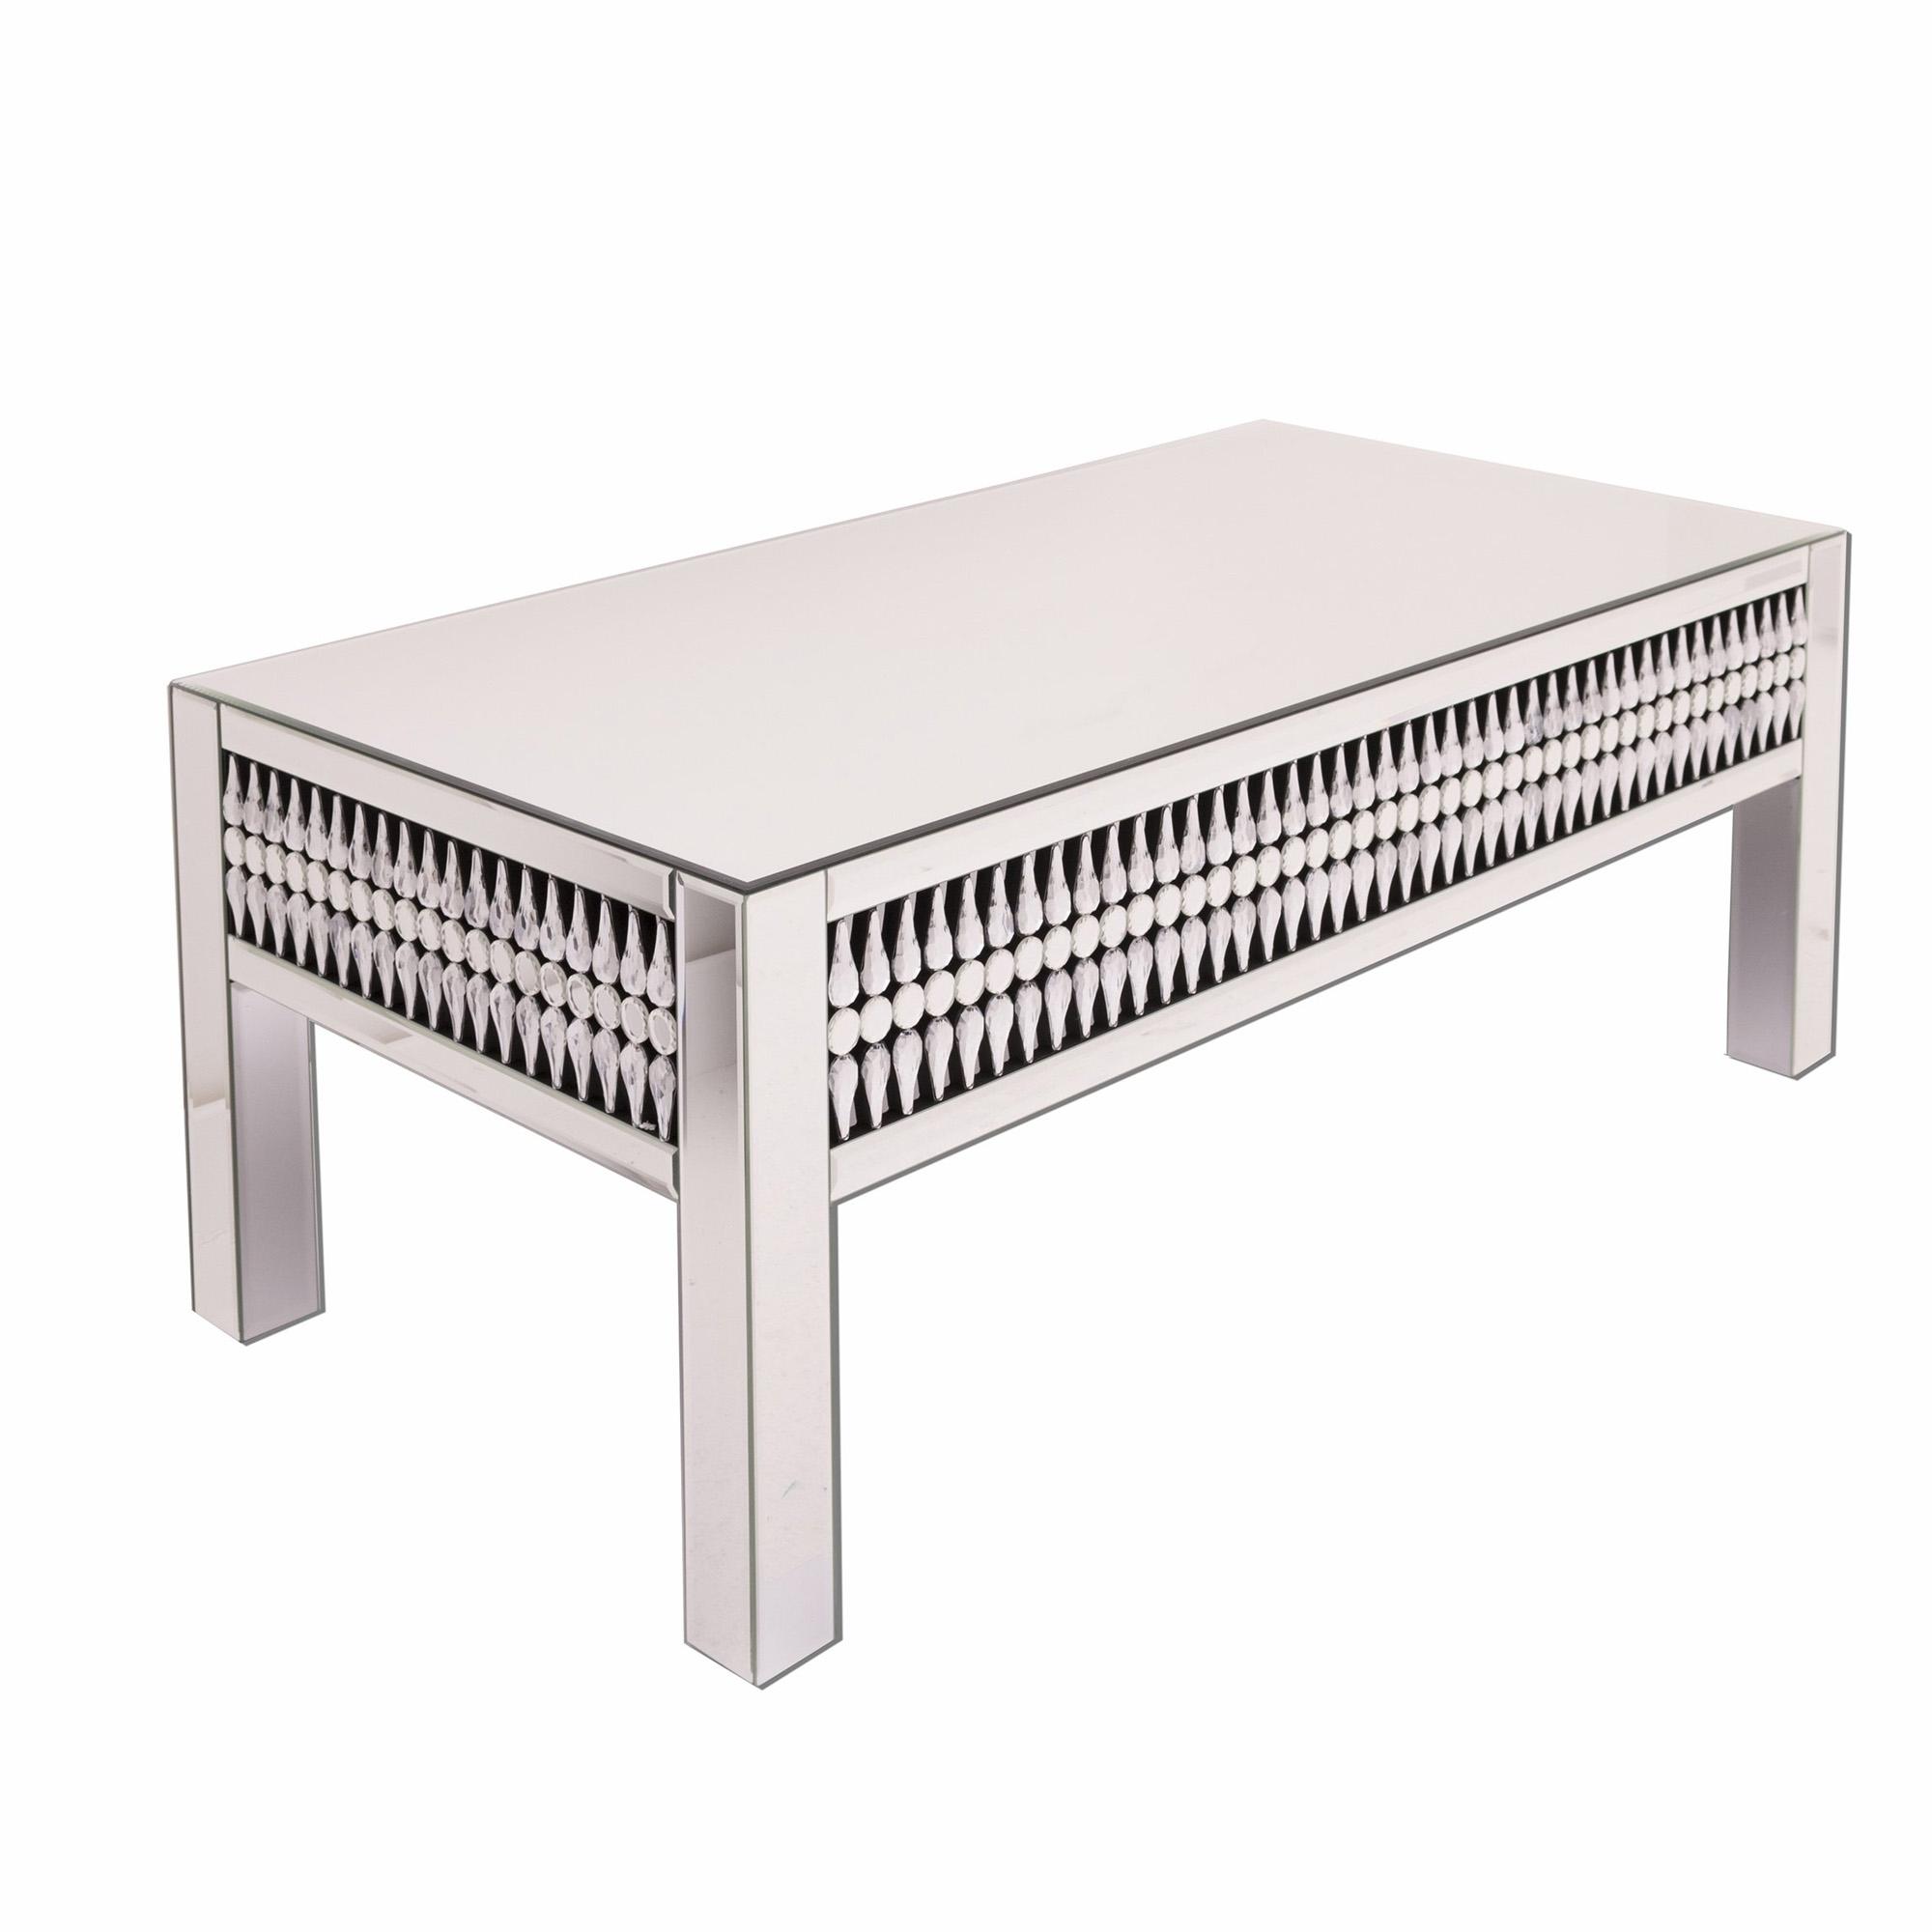 Astonishing Teardrop Mirrored Coffee Table Dailytribune Chair Design For Home Dailytribuneorg